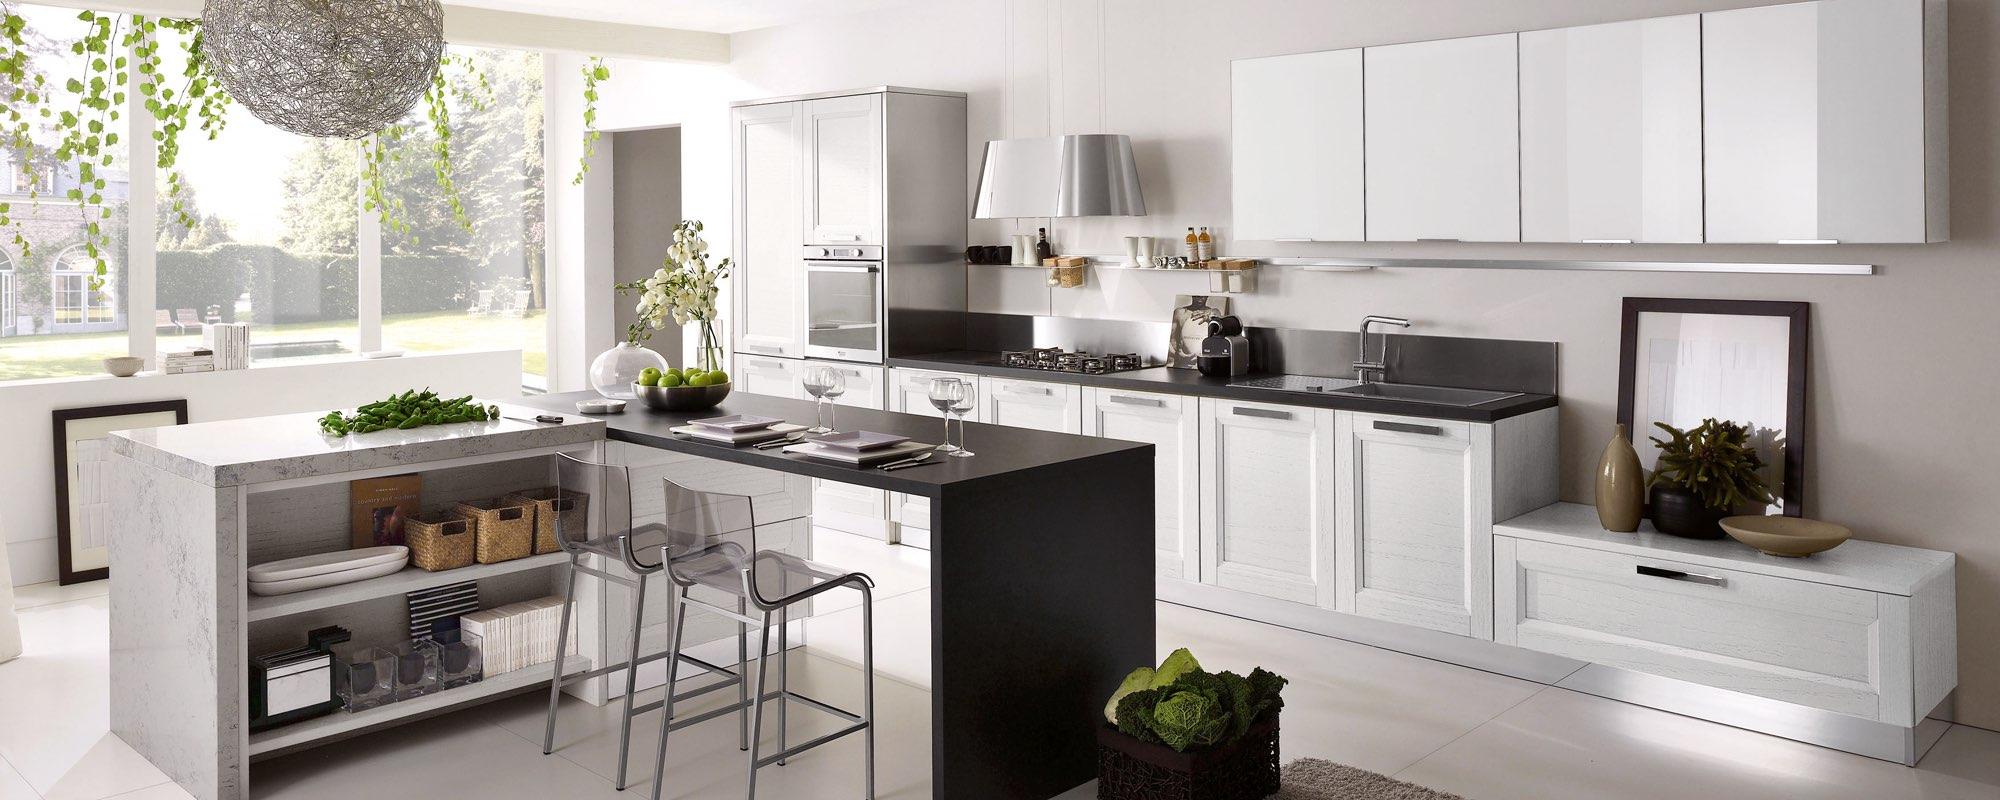 Cucina stosa bianca e nera -Beverly